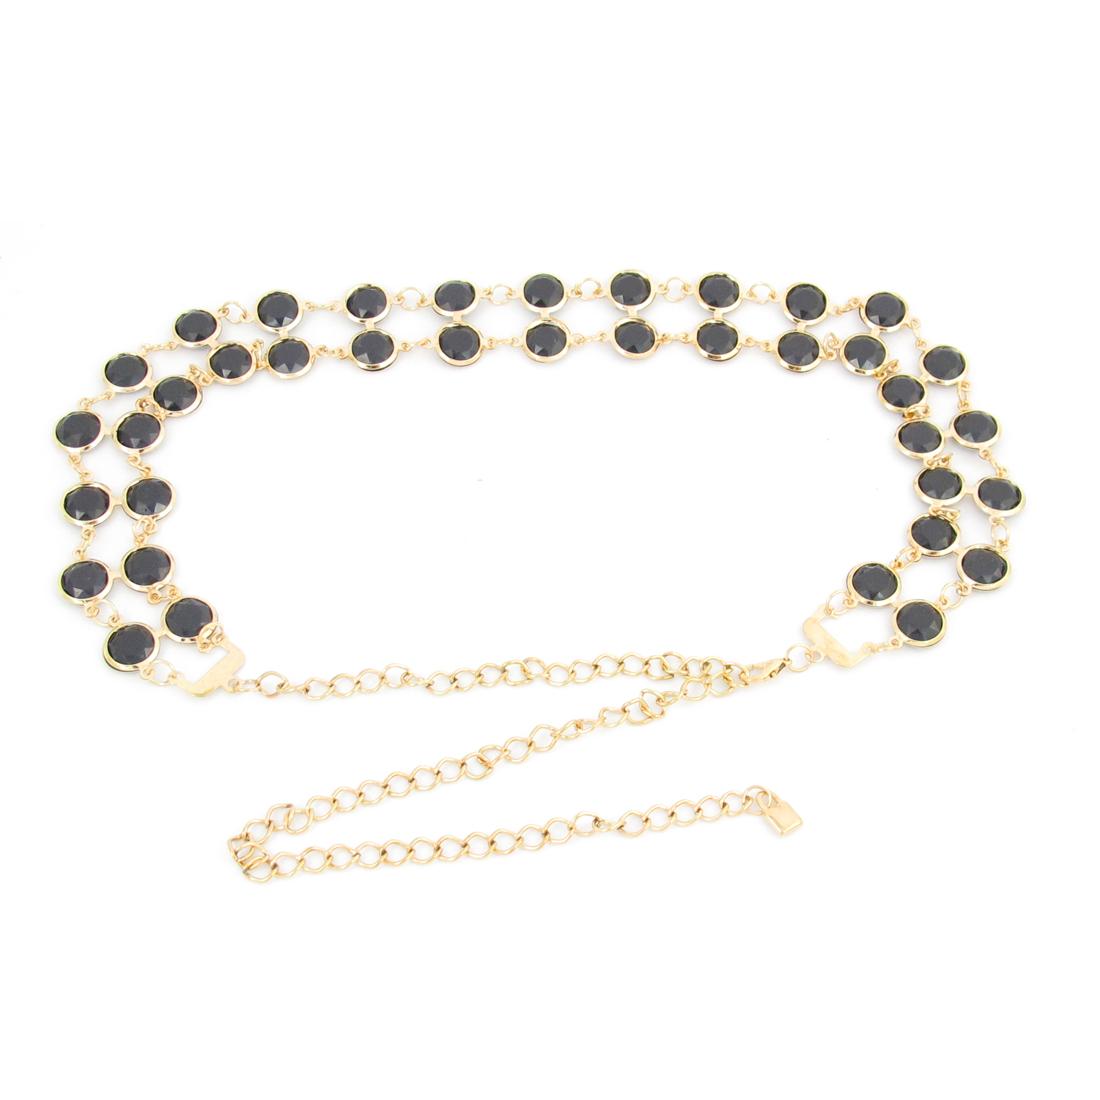 Ladies Rhinestones Inlaid Metallic Waist Chain Belt Black